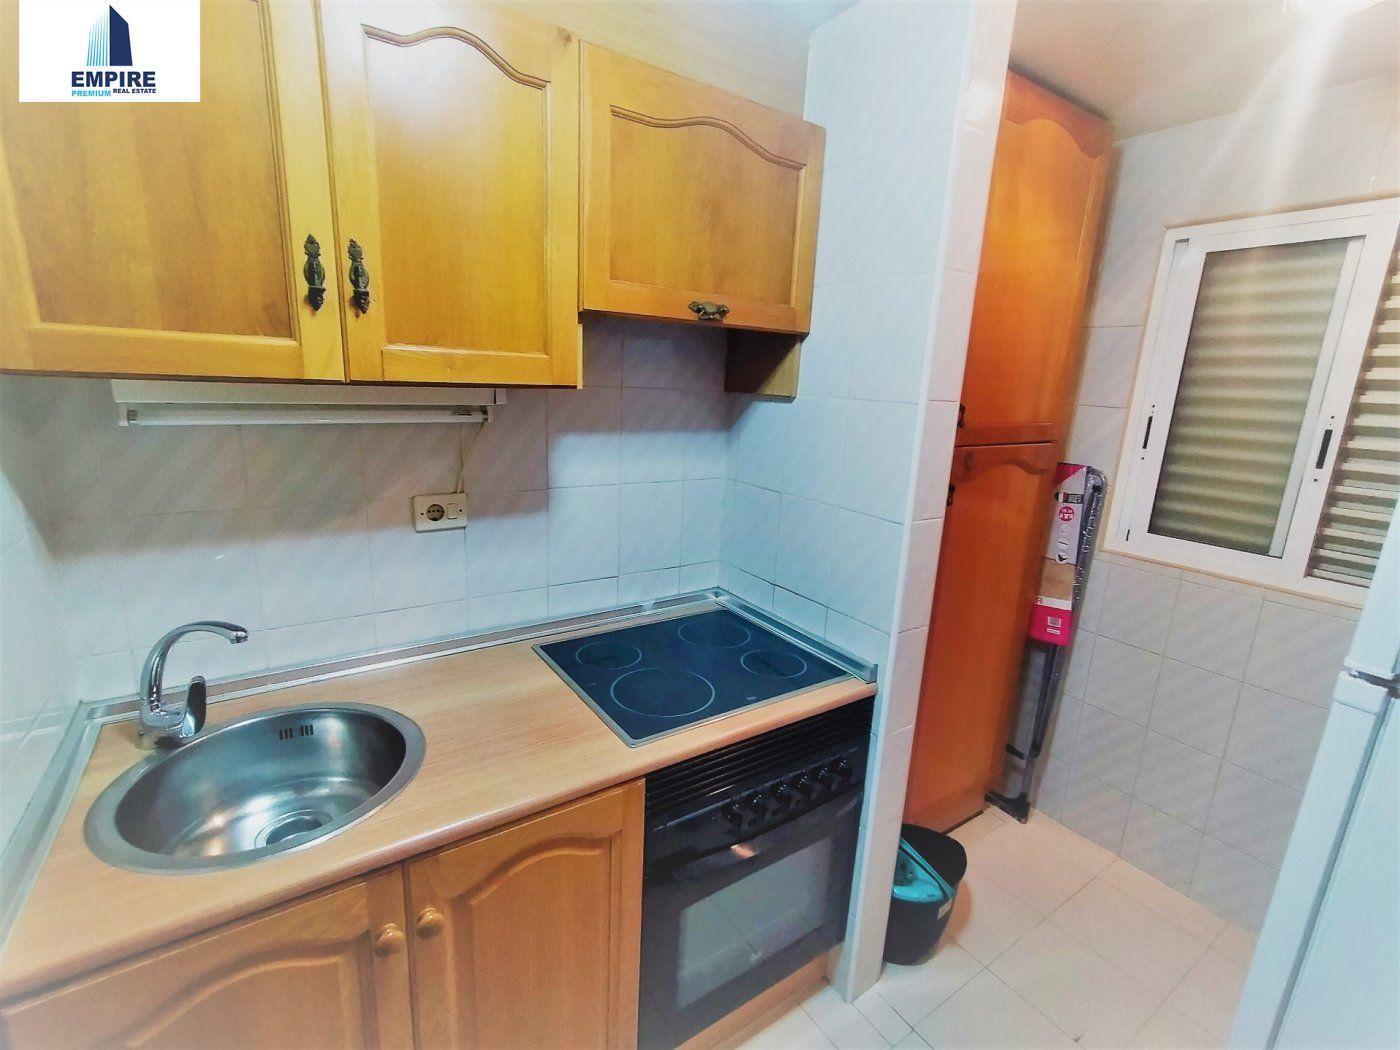 Apartamento · Benidorm · Juzgados 500€ MES€